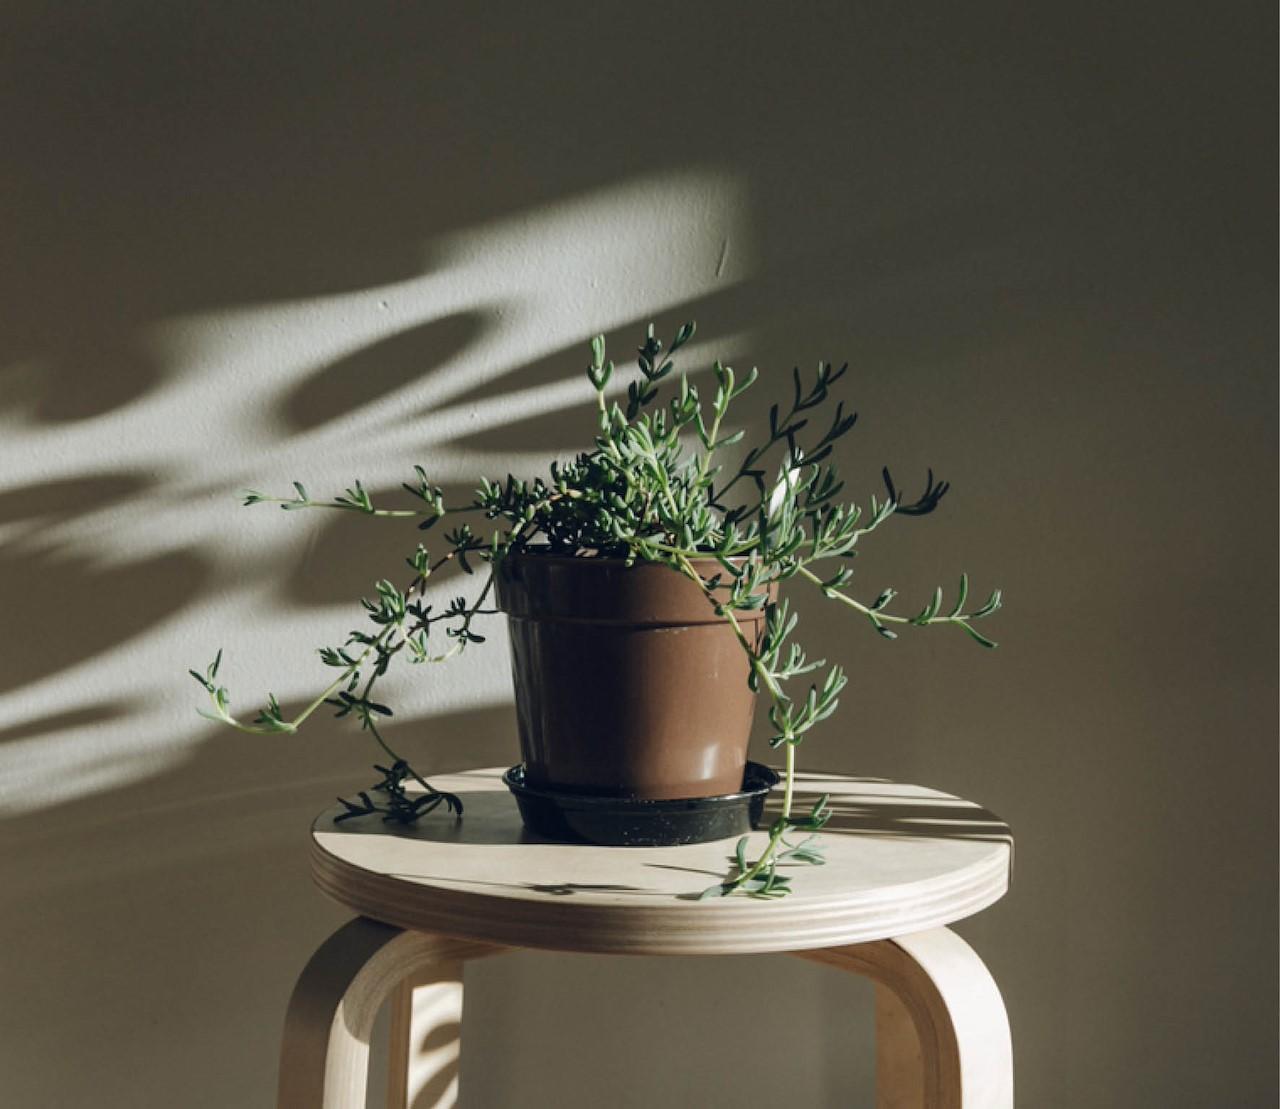 Weinig licht? Deze kamerplanten houden van donker.